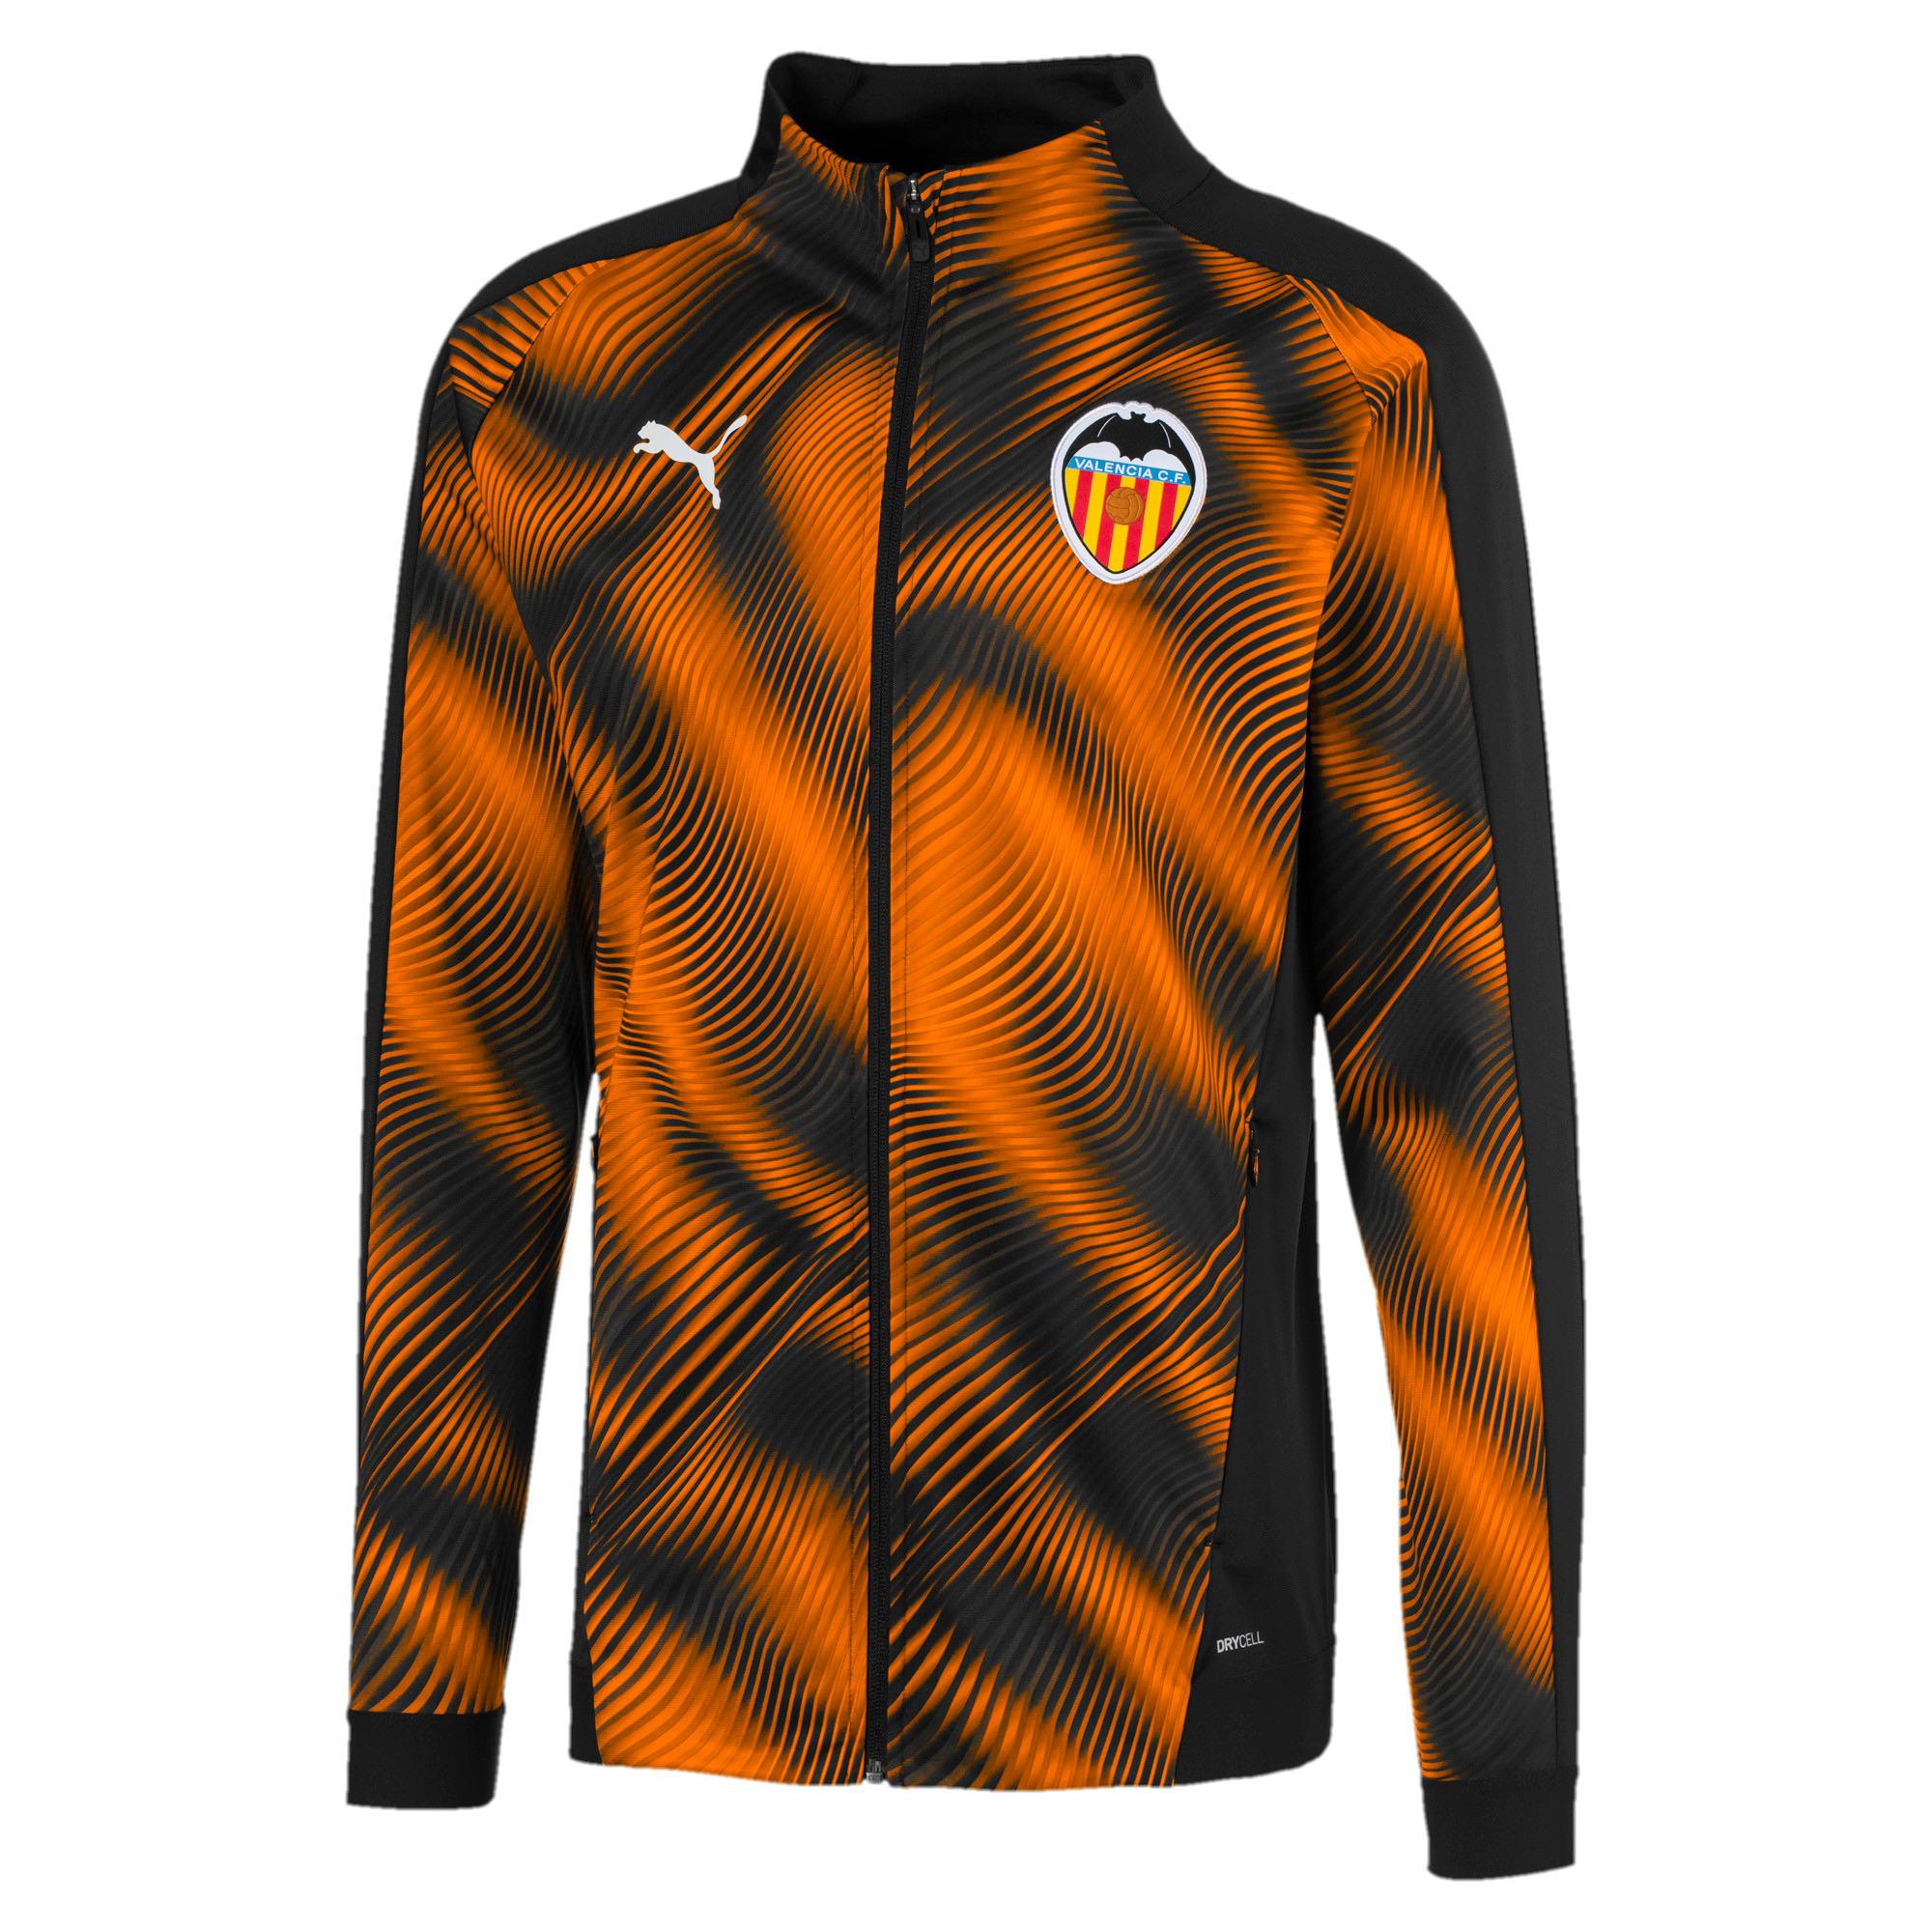 Thumbnail 1 van Valencia CF stadionjack voor mannen, Puma zwart-vibrant orange, medium